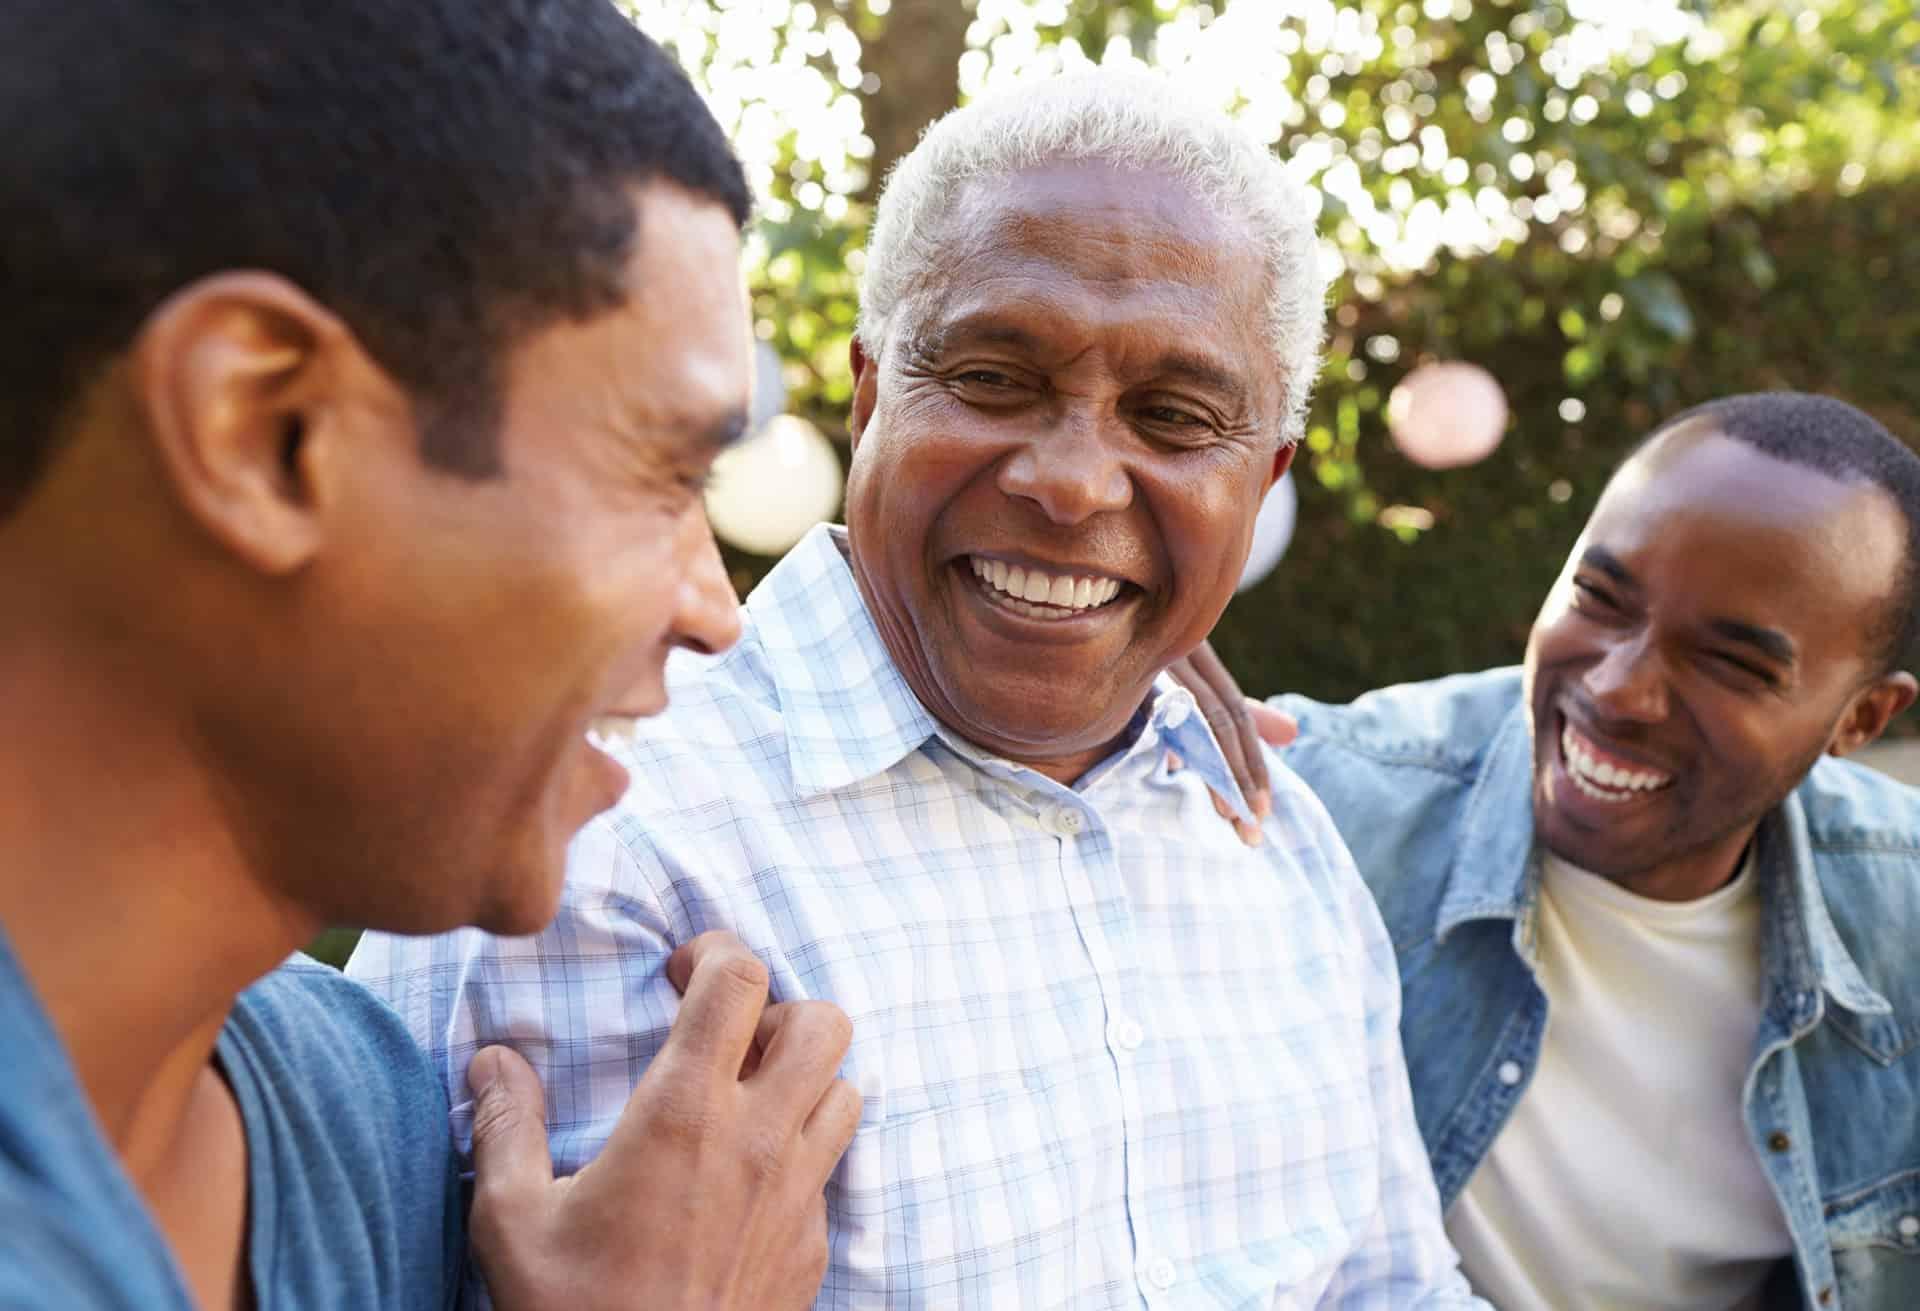 Senior man enjoying talking with his adult sons in garden